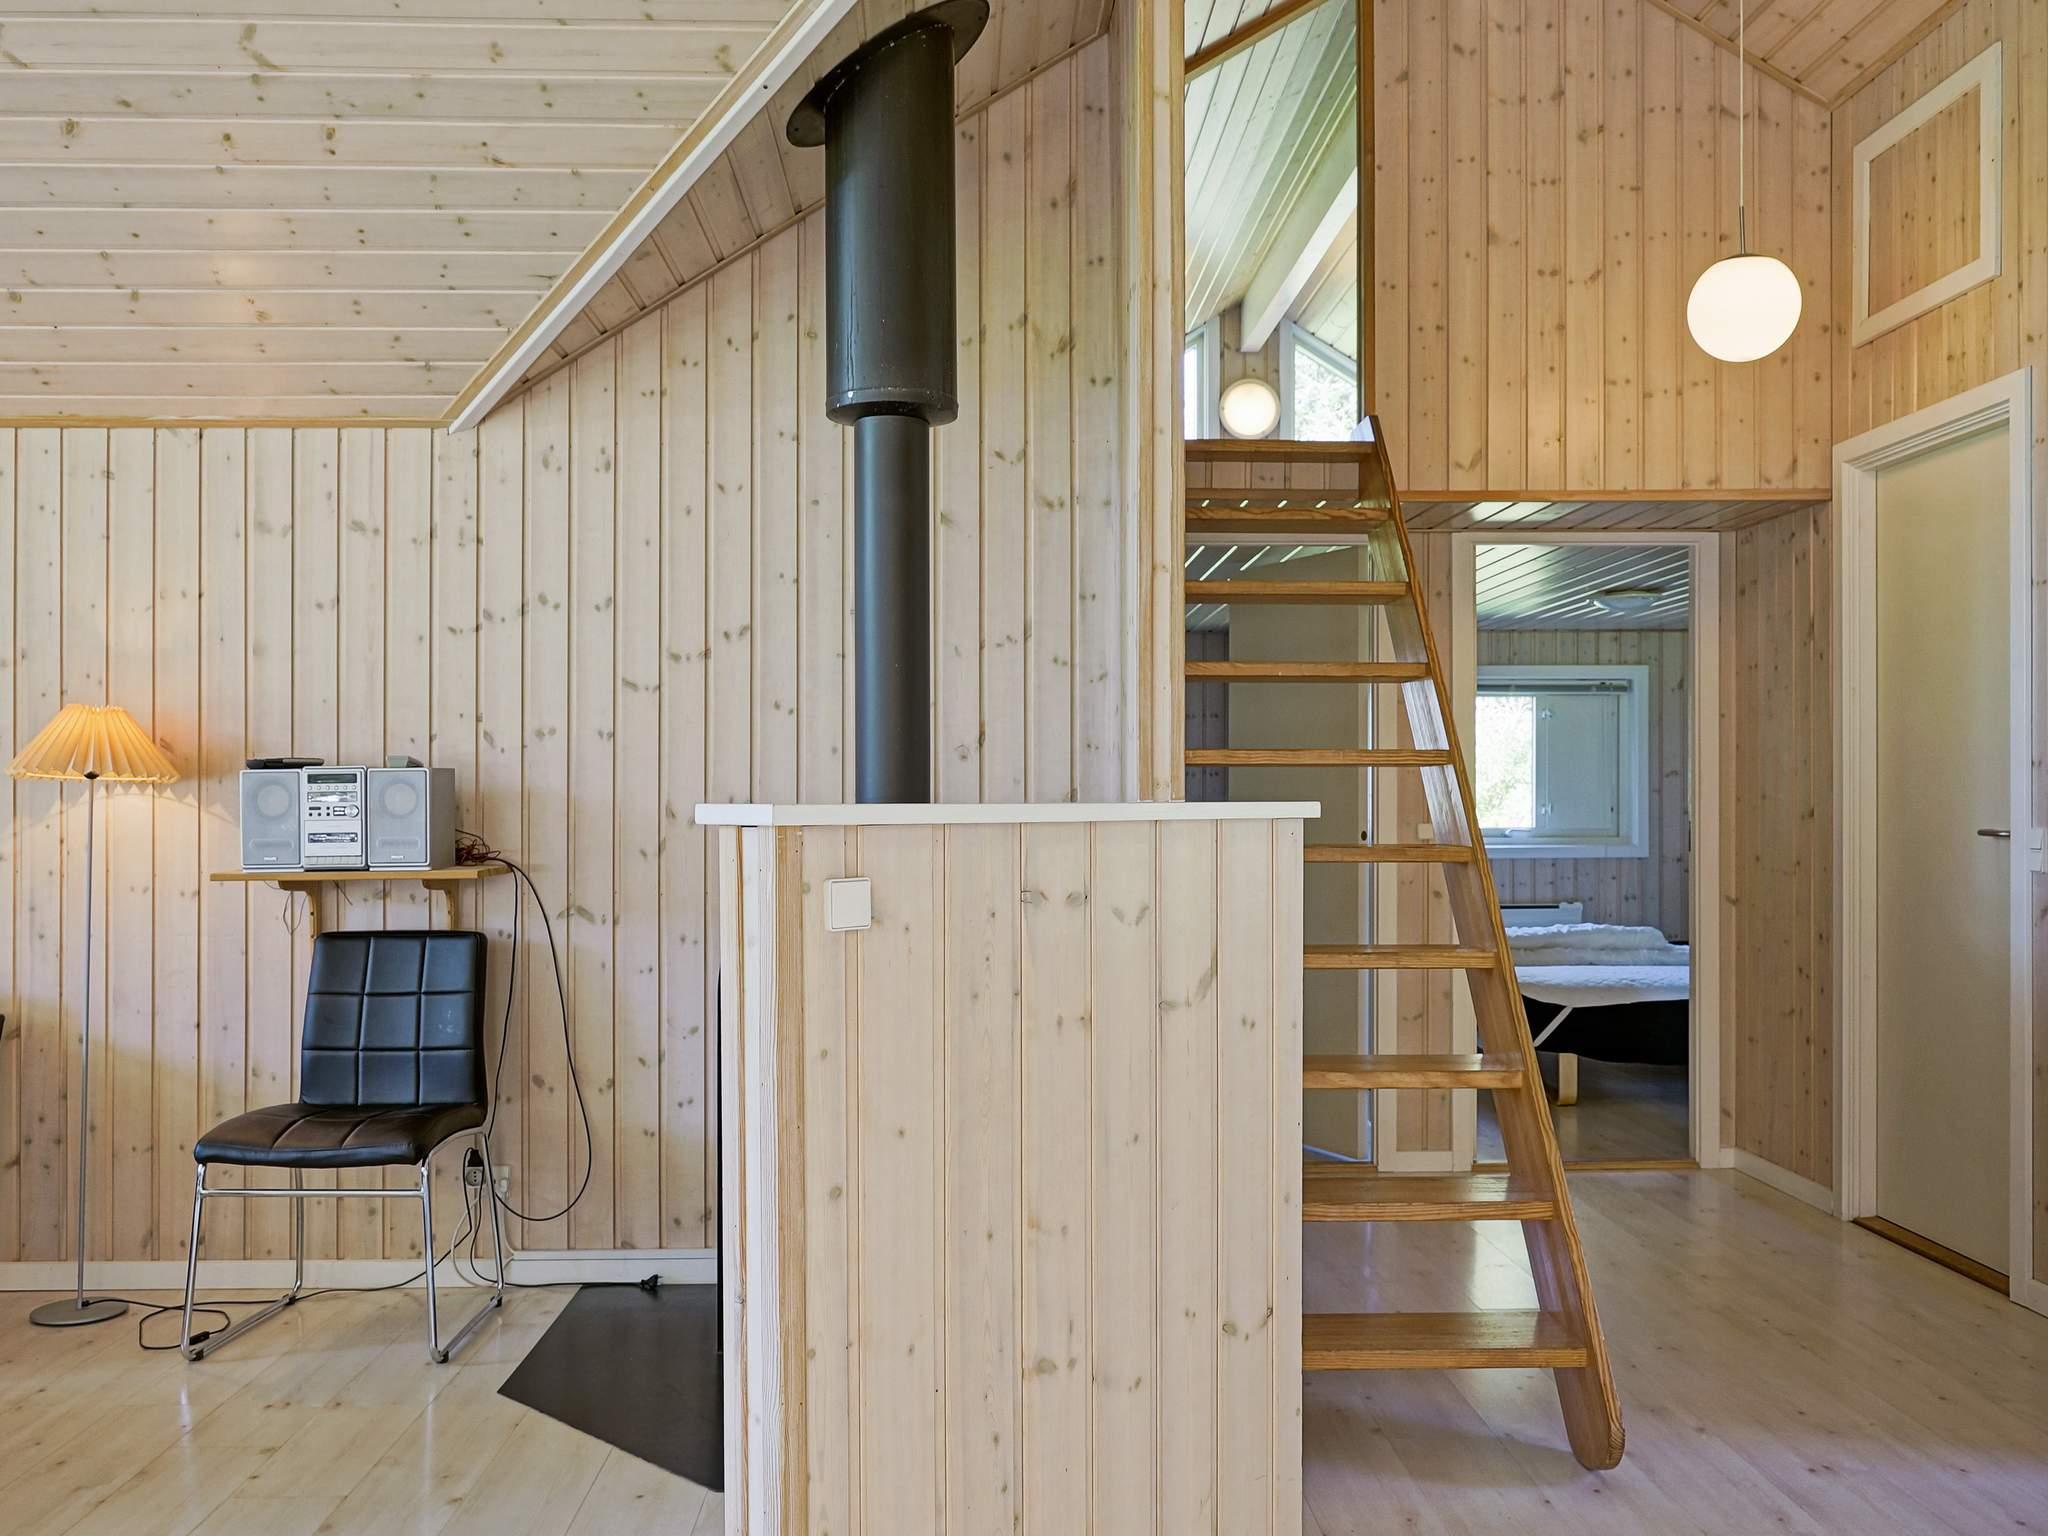 Maison de vacances Østre Sømarken (82470), Aakirkeby, , Bornholm, Danemark, image 8